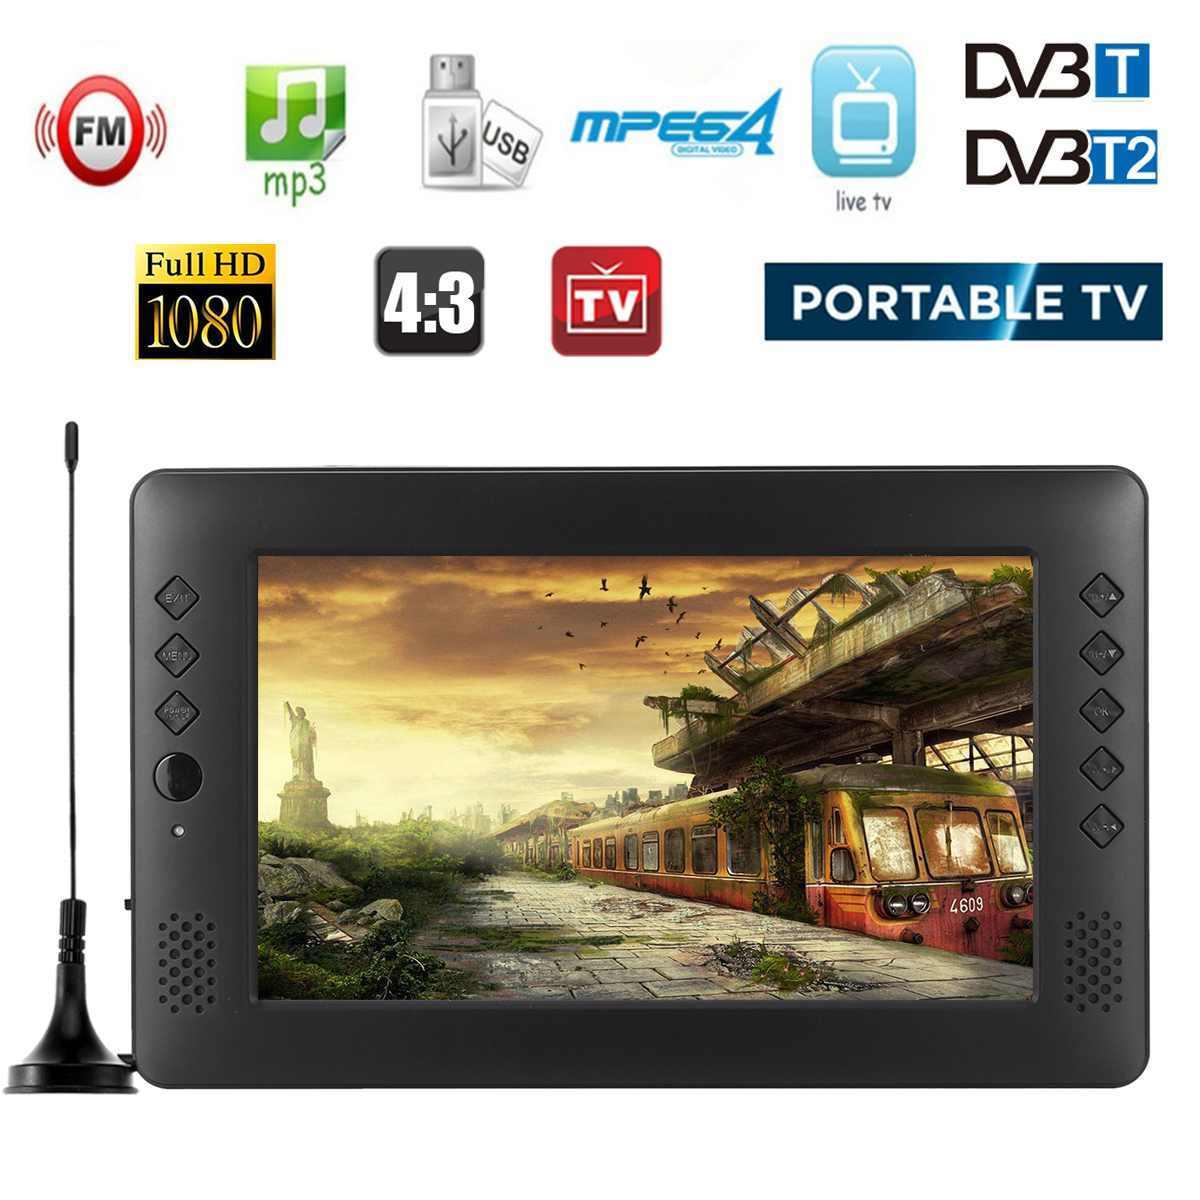 12V 9 inch HD Portable Mini WiFi Digital and Analog TV DVB-T2 DVB-T DTV ATV Car Smart Television Support USB TF Card MP4